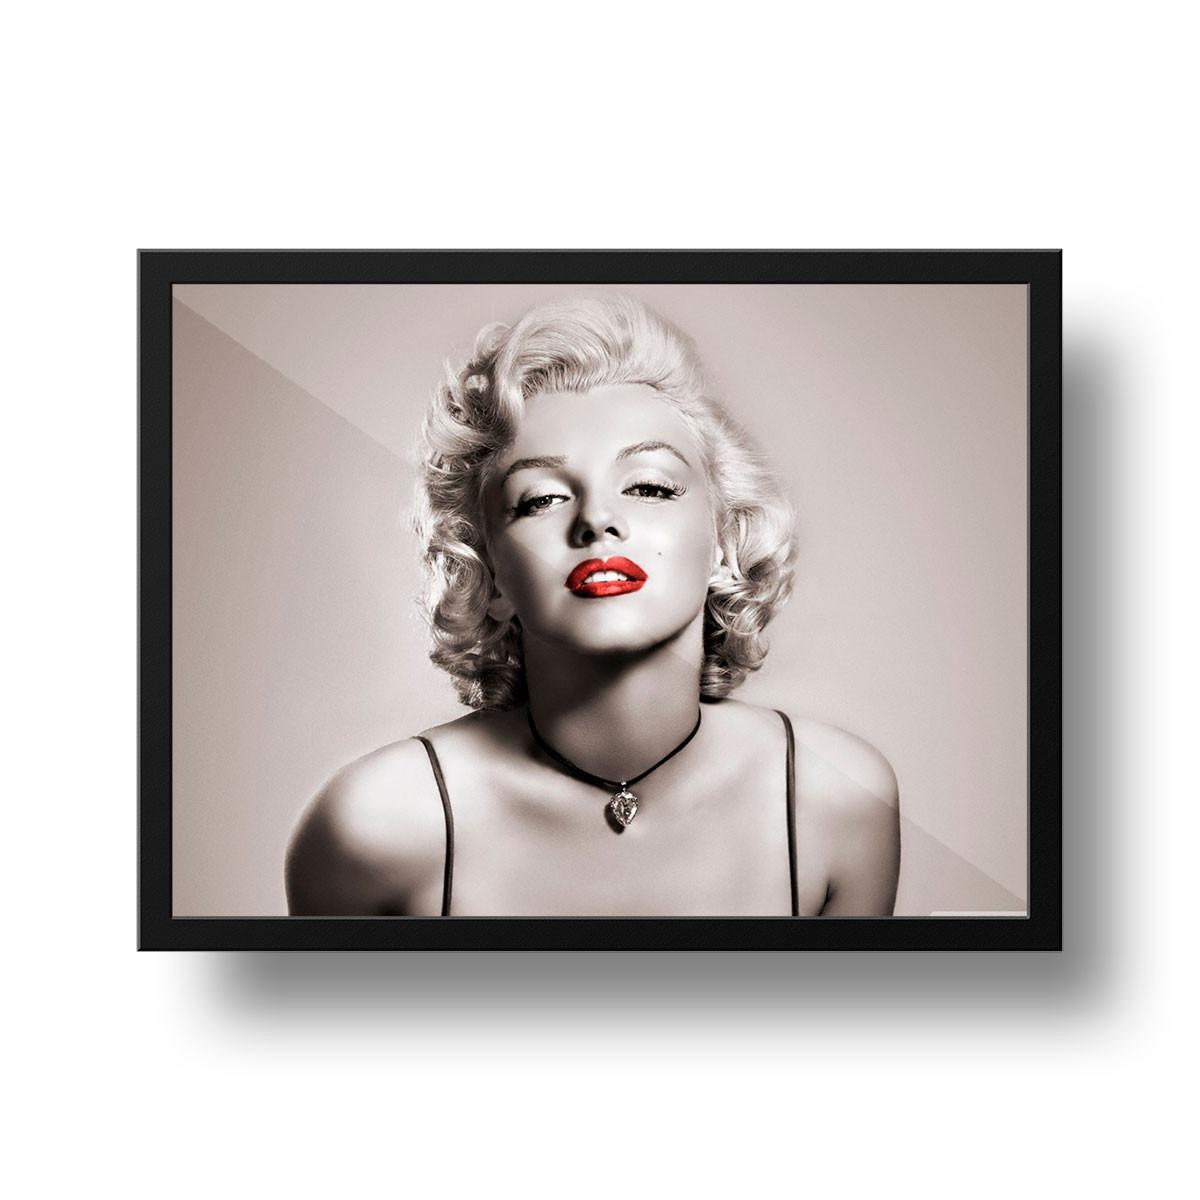 Quadro Marilyn Monroe Decorao Salo De Beleza  Brinde  R 4999 em Mercado Livre